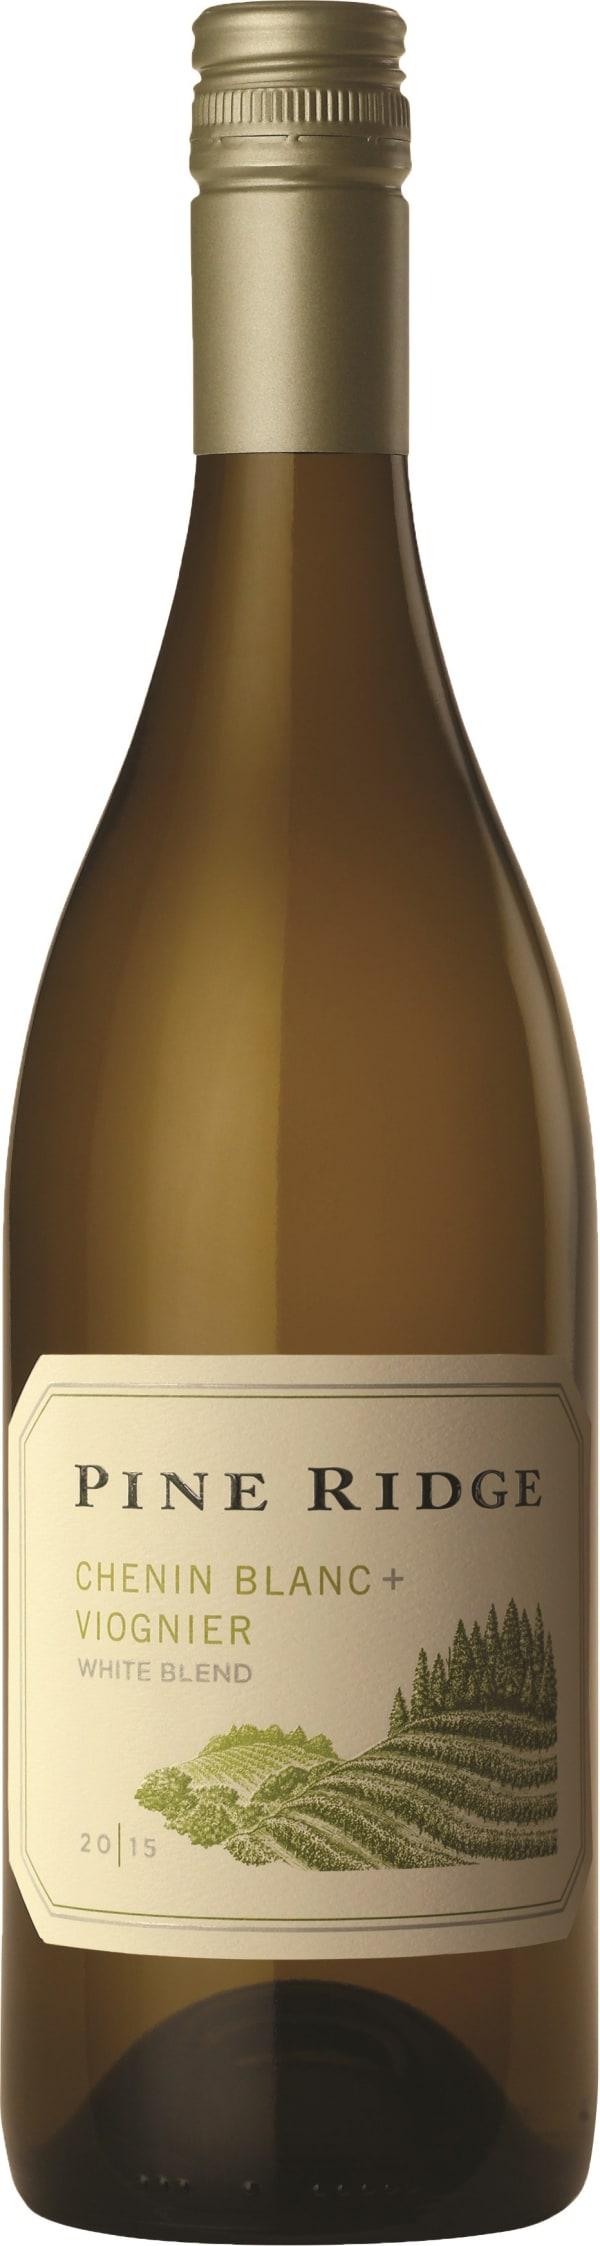 Pine Ridge Vineyards Chenin Blanc + Viognier 2015